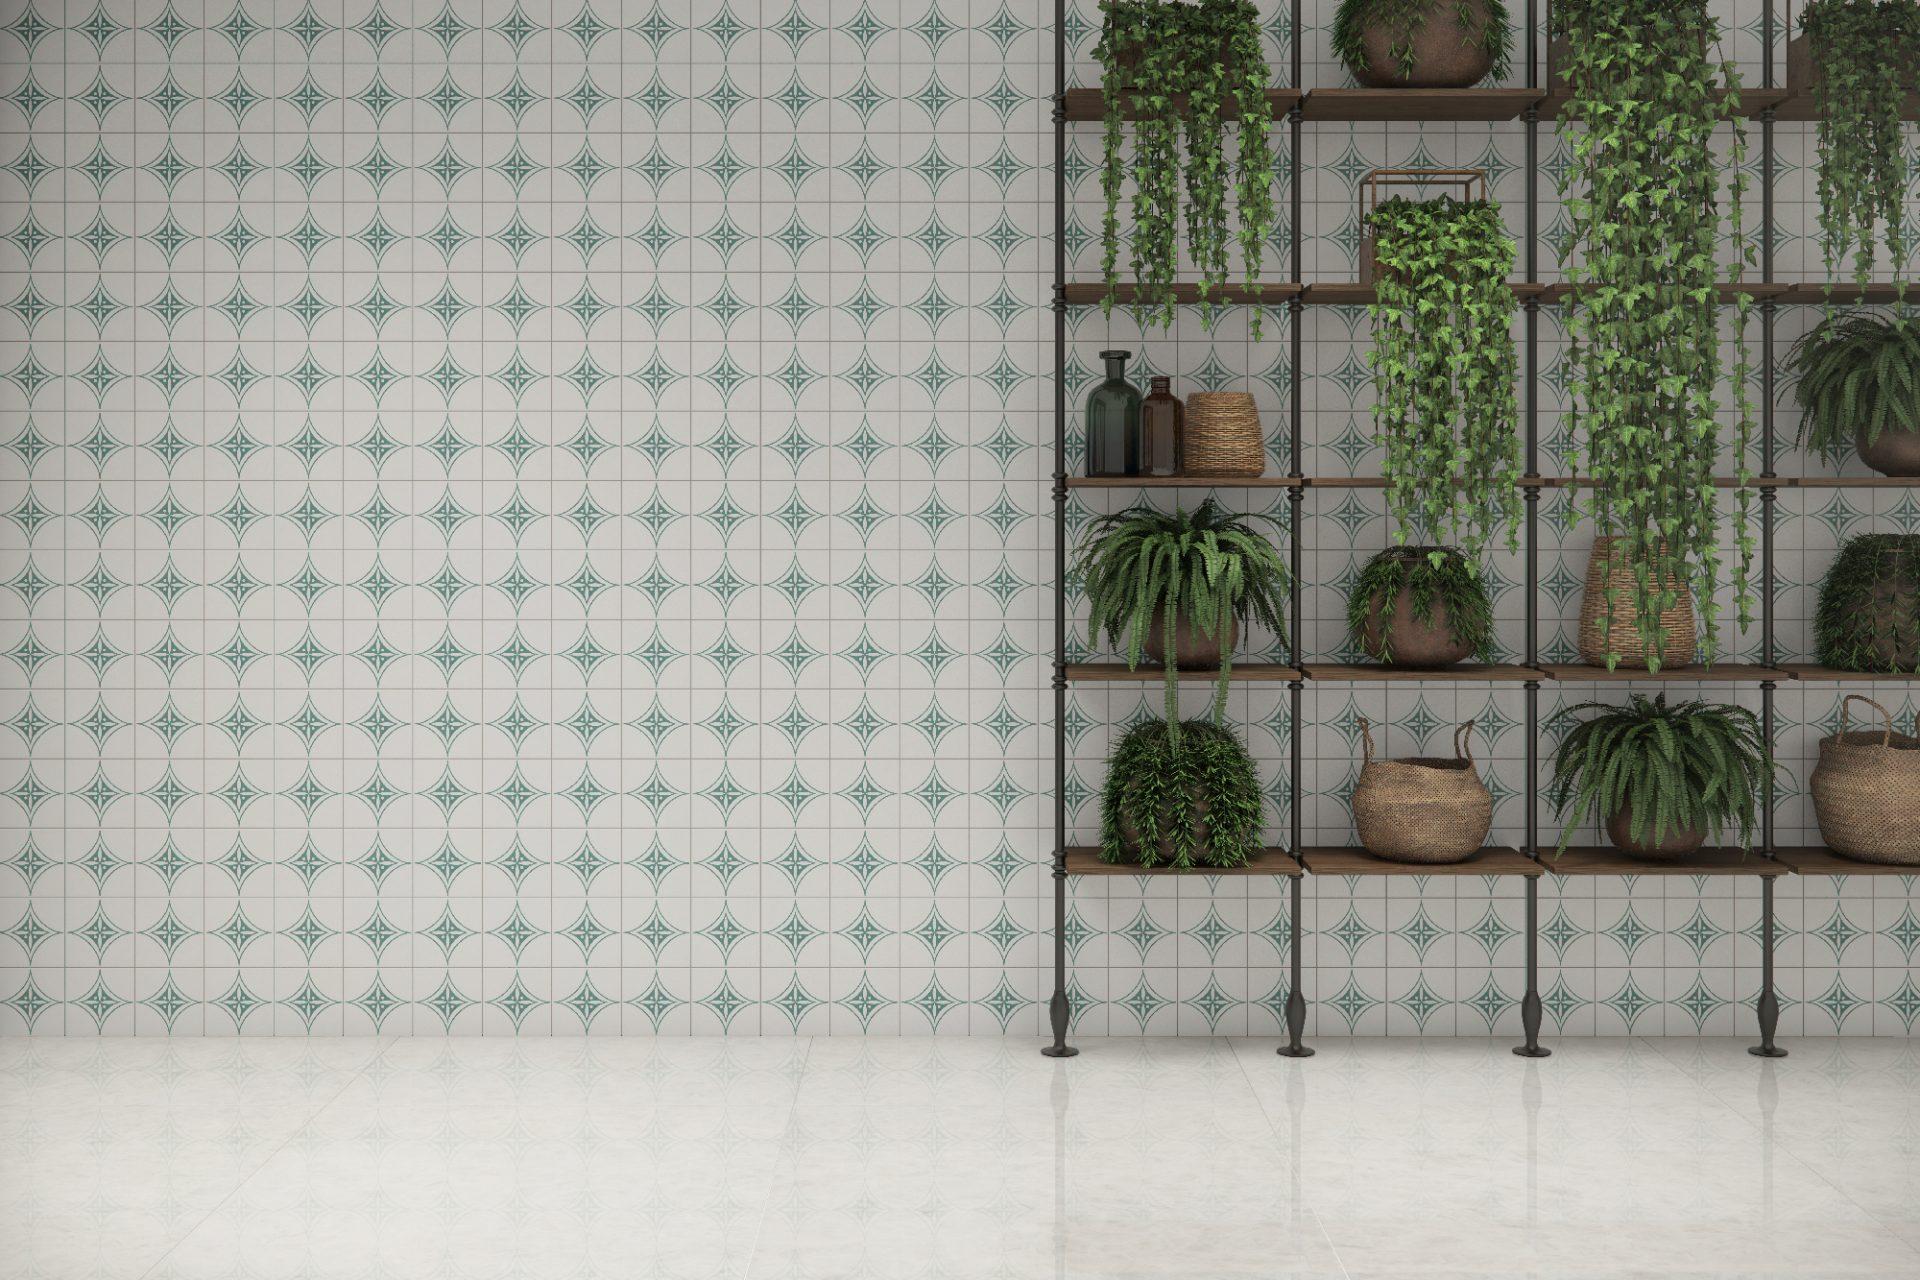 Sidereal Green AC 15x15cm – Crystal Quartzo PO 90x90cm